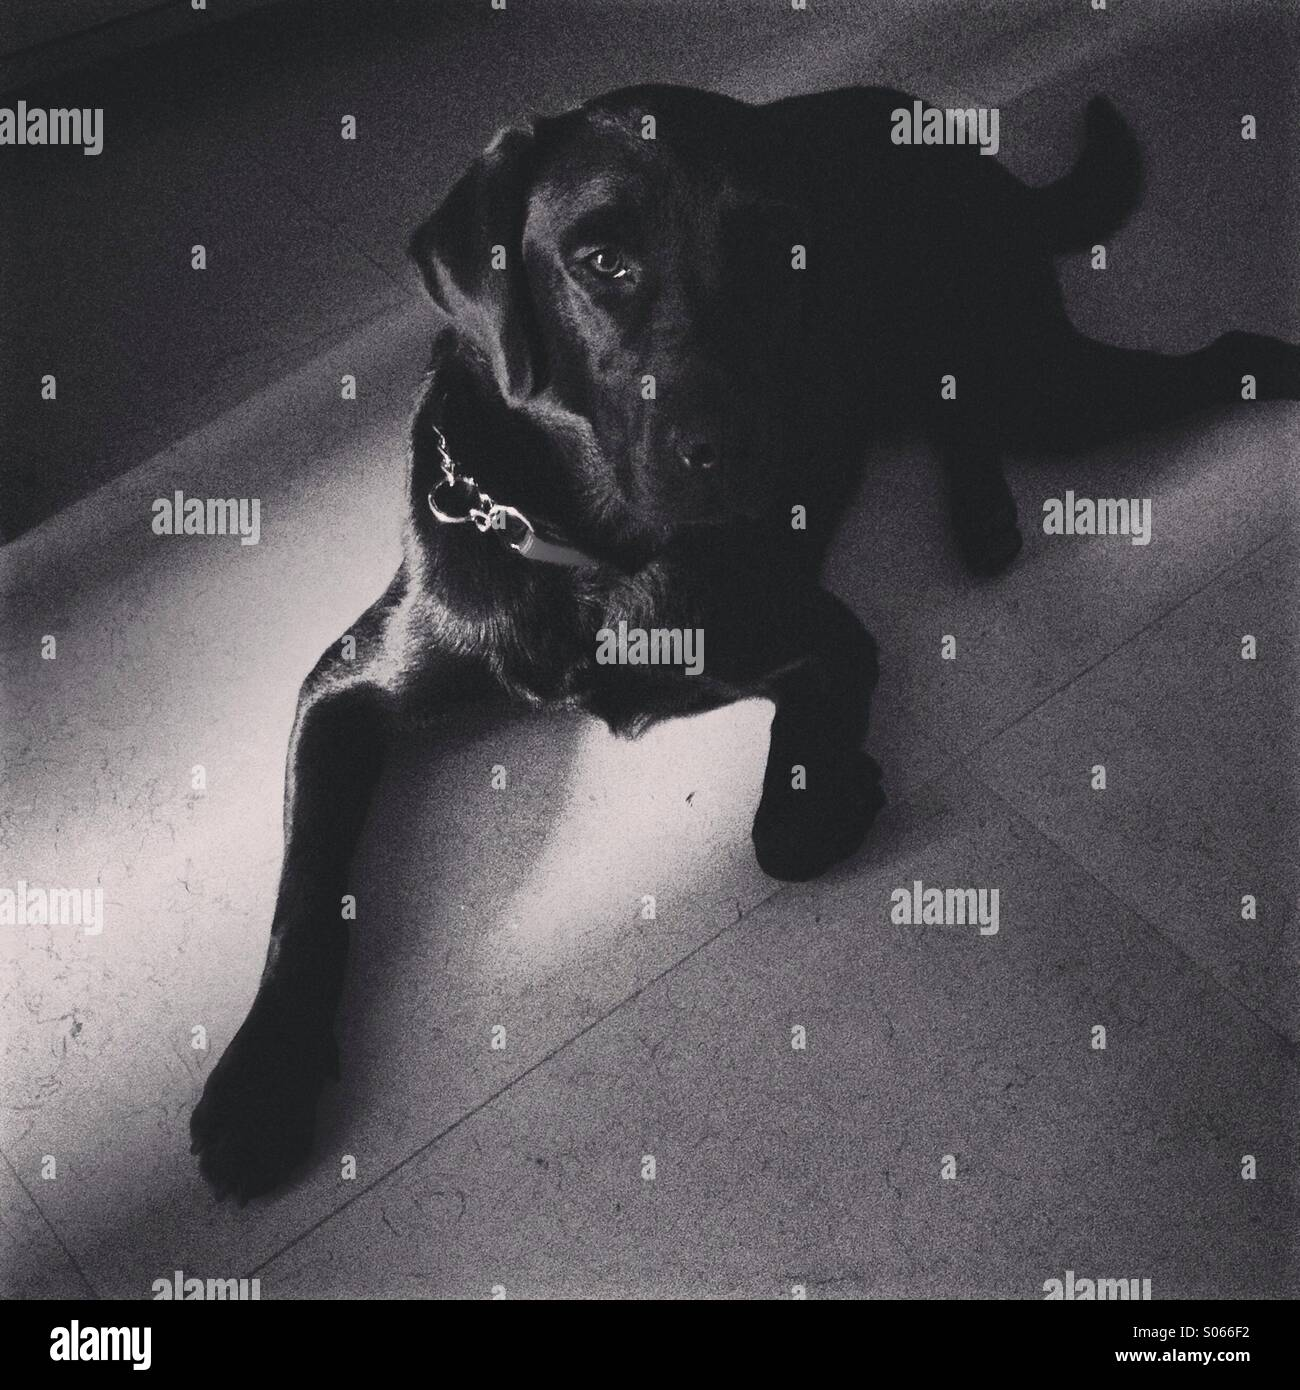 Black dog Labrador Retriever looking at camera - Stock Image